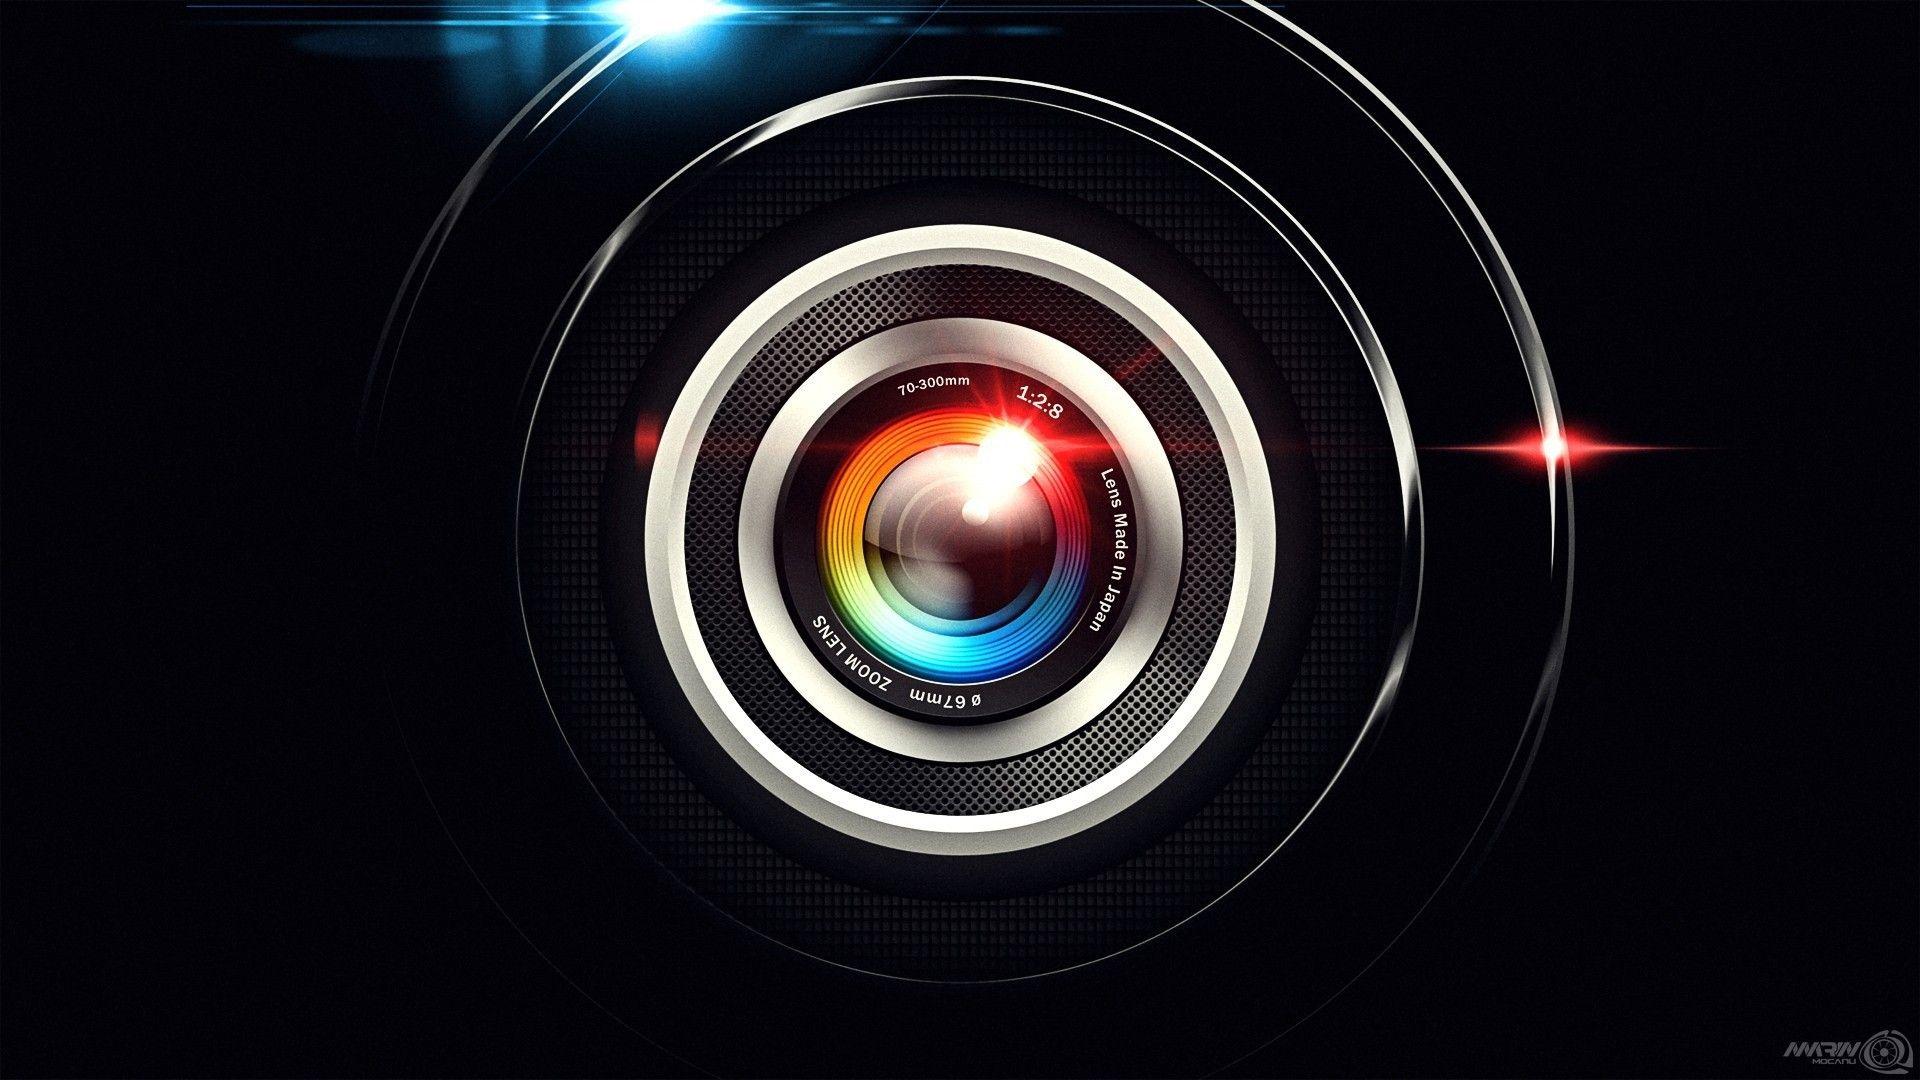 Camera lens high tech flare technic wallpaper (75402